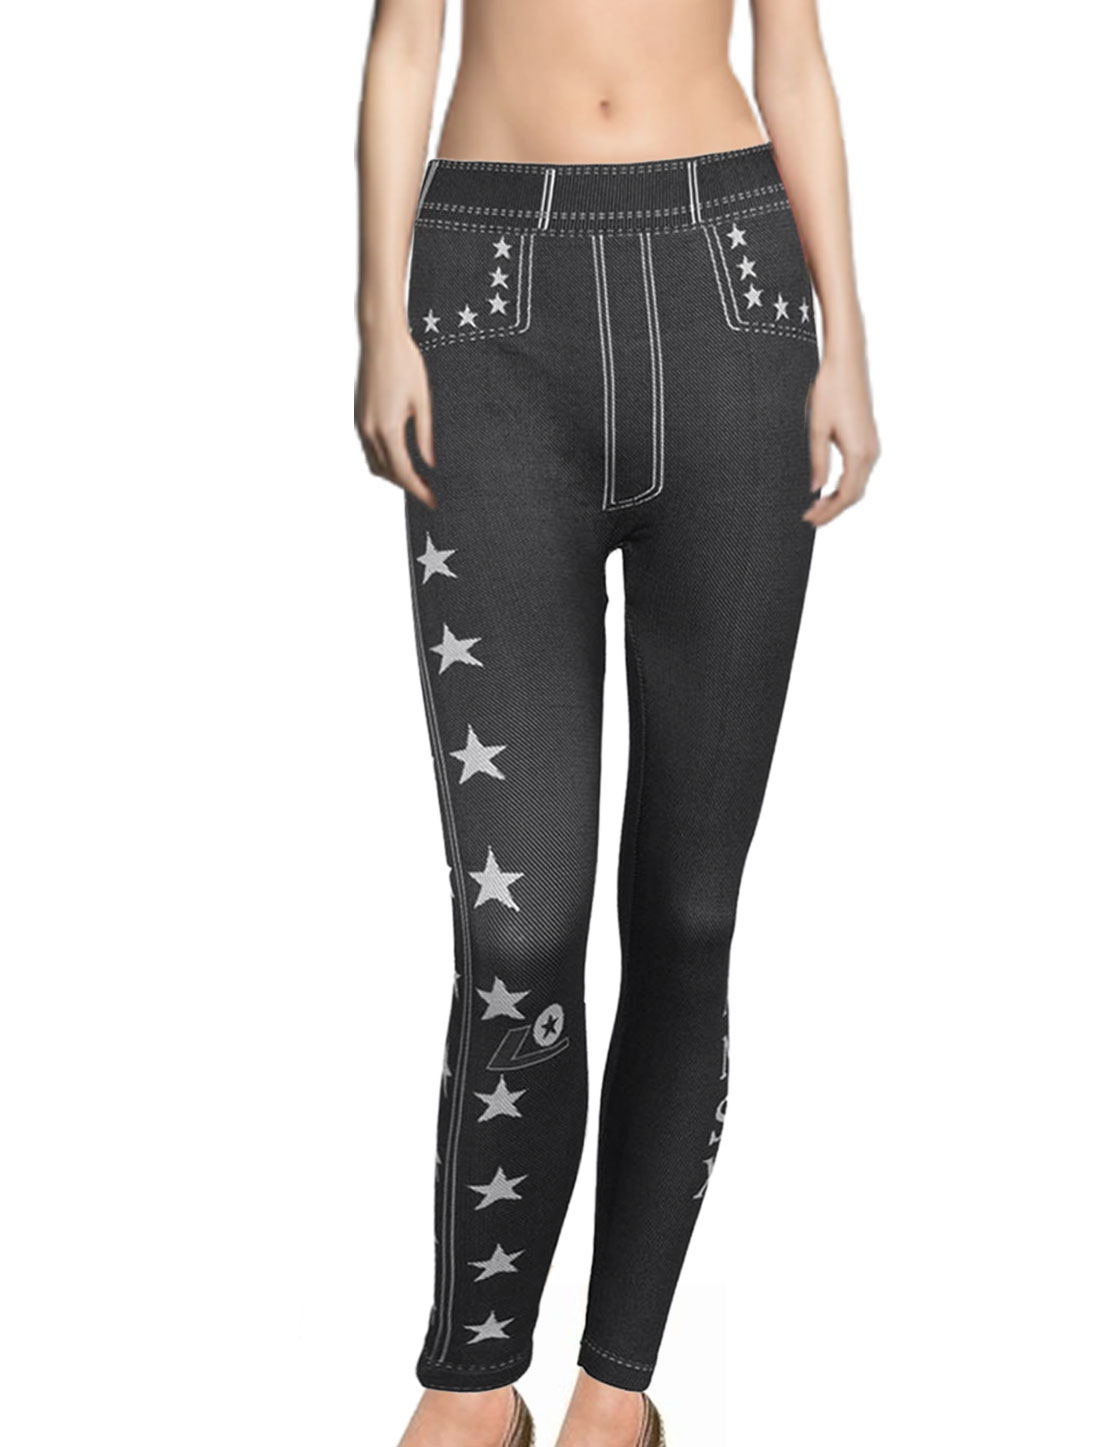 Ladies Stars Pattern Black Denim Style Leggings Pantyhose K1693 S